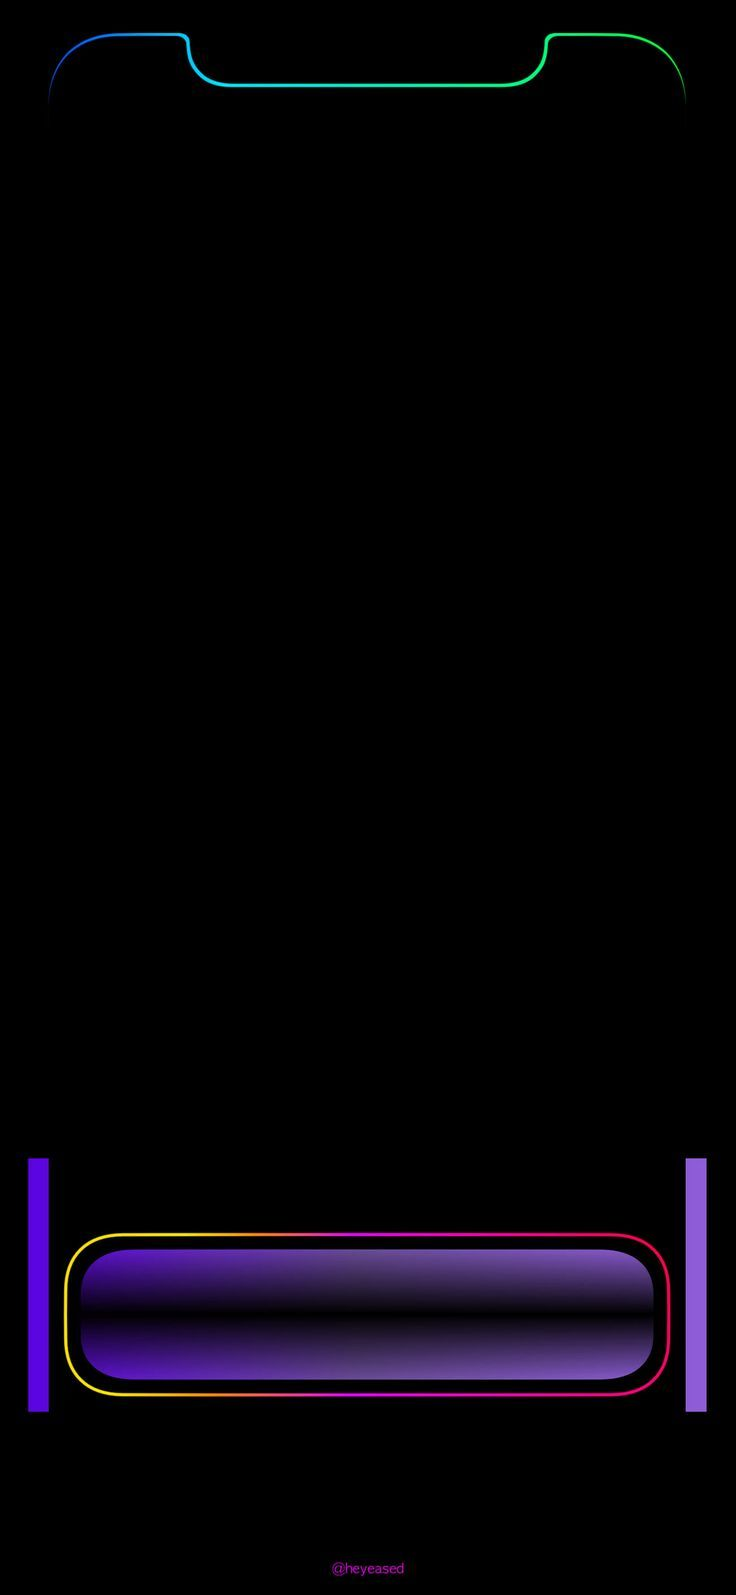 Iphone X Home Screen - HD Wallpaper